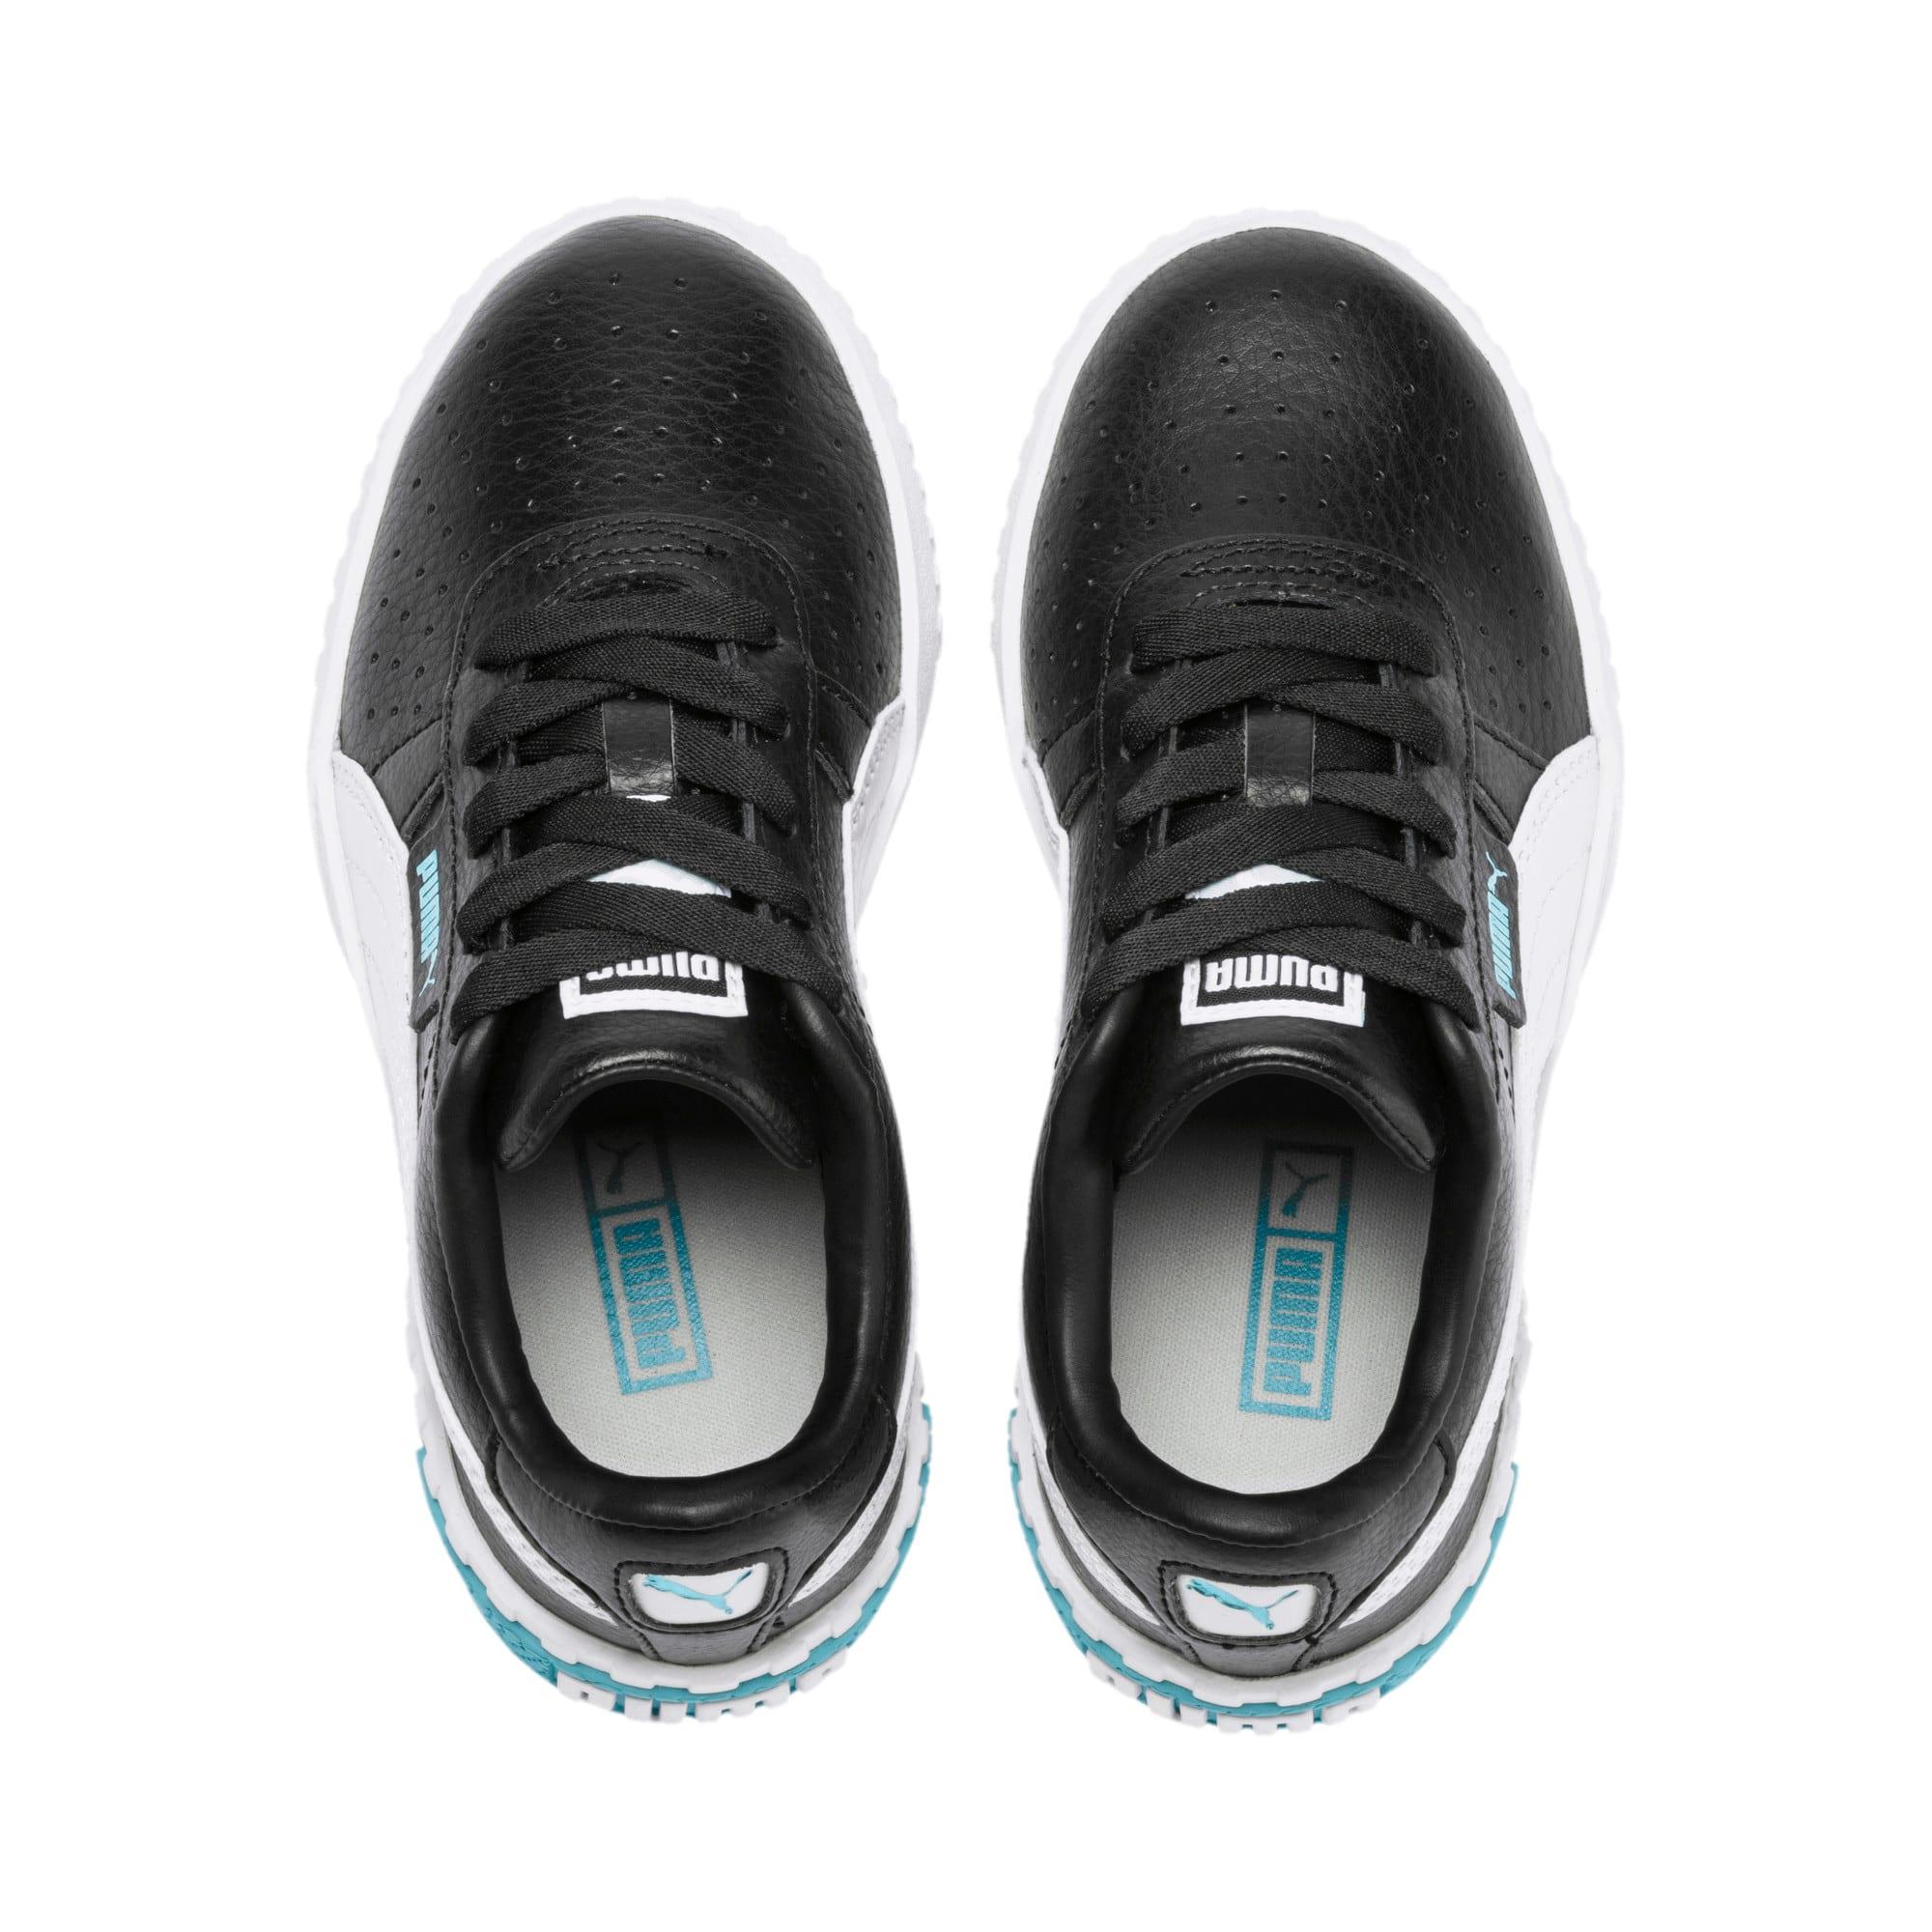 Thumbnail 6 of Cali Little Kids' Shoes, Puma Black-Milky Blue, medium